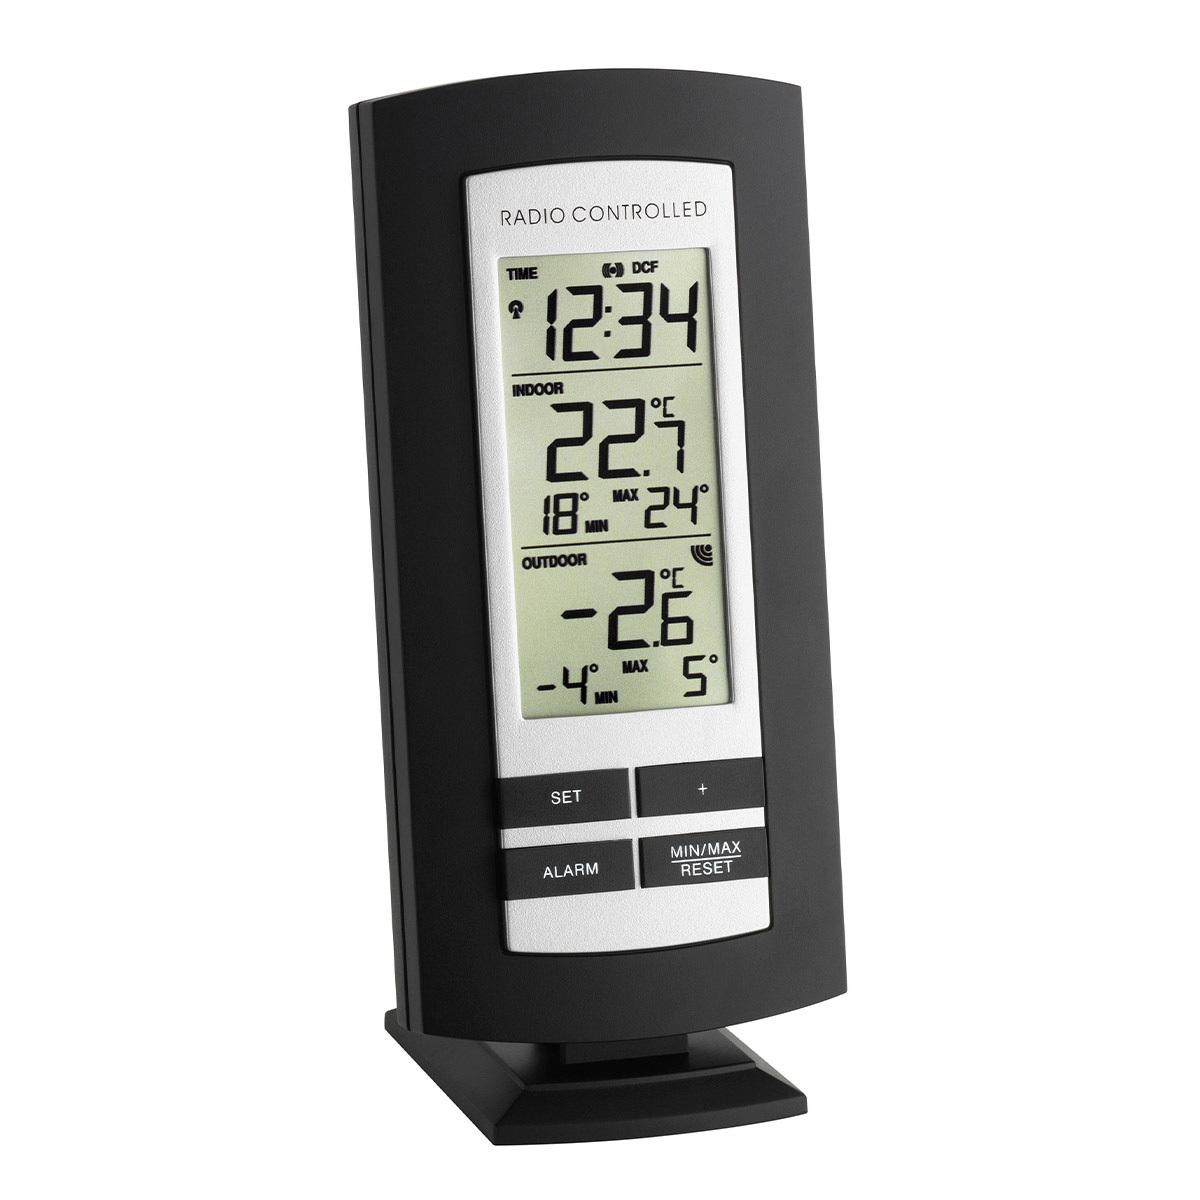 30-3037-01-it-funk-thermometer-basic-1200x1200px.jpg